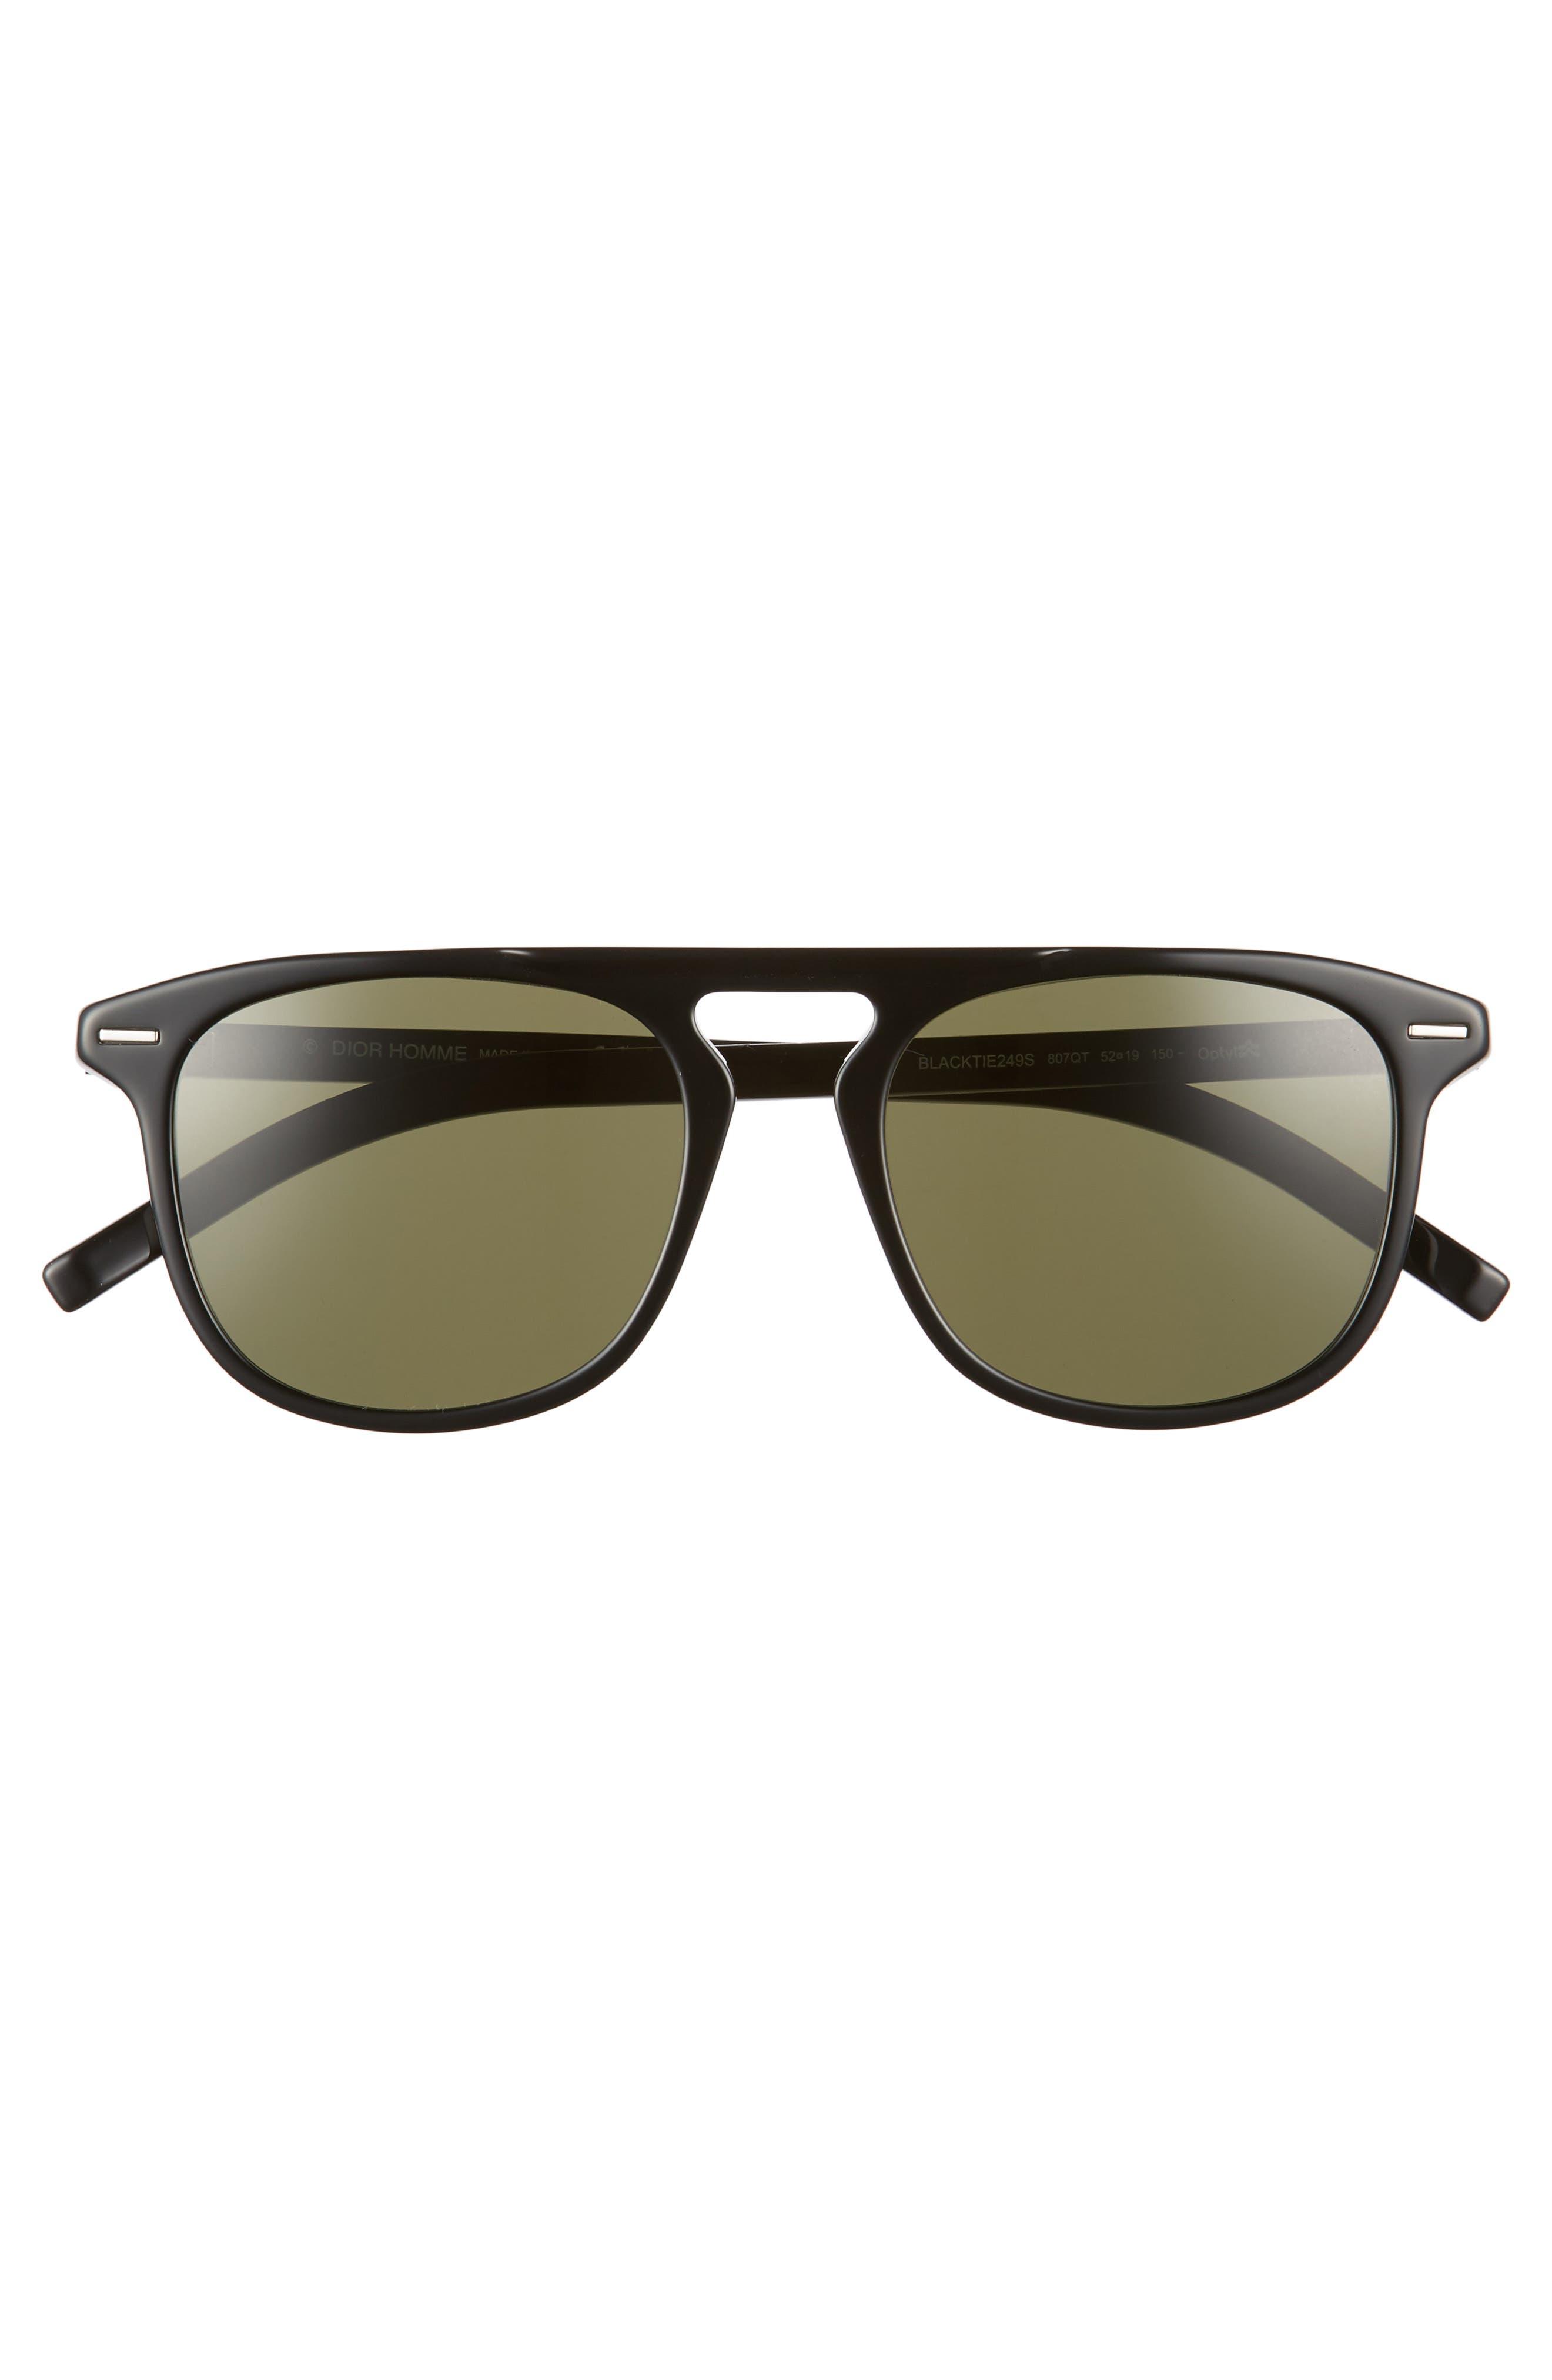 52mm Sunglasses,                             Alternate thumbnail 2, color,                             001